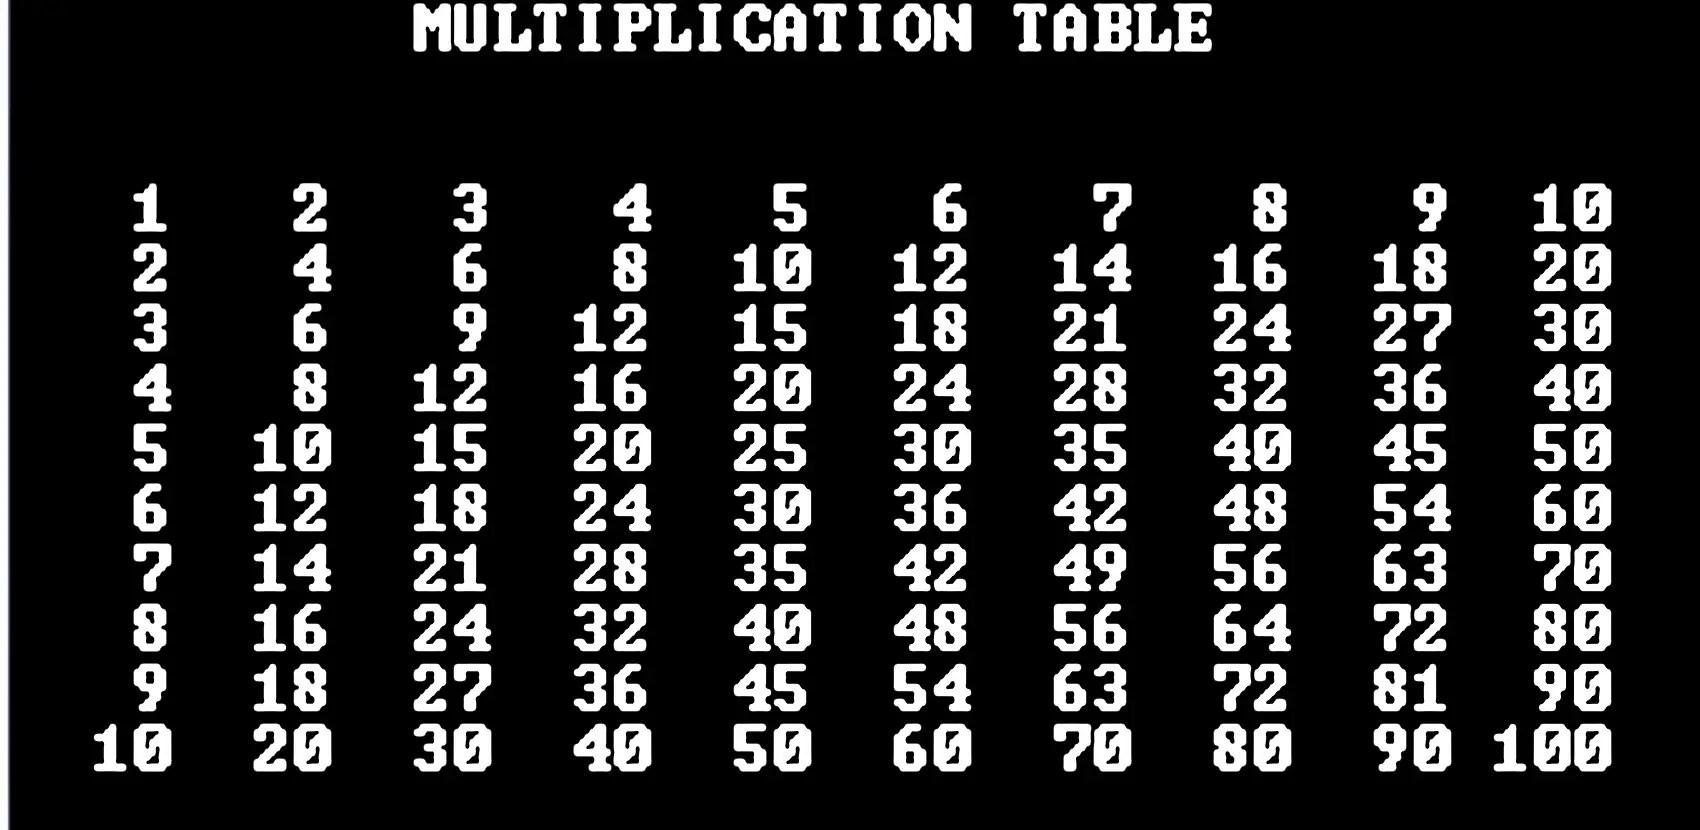 34 Info Multiplication Table In Java Hd Printable